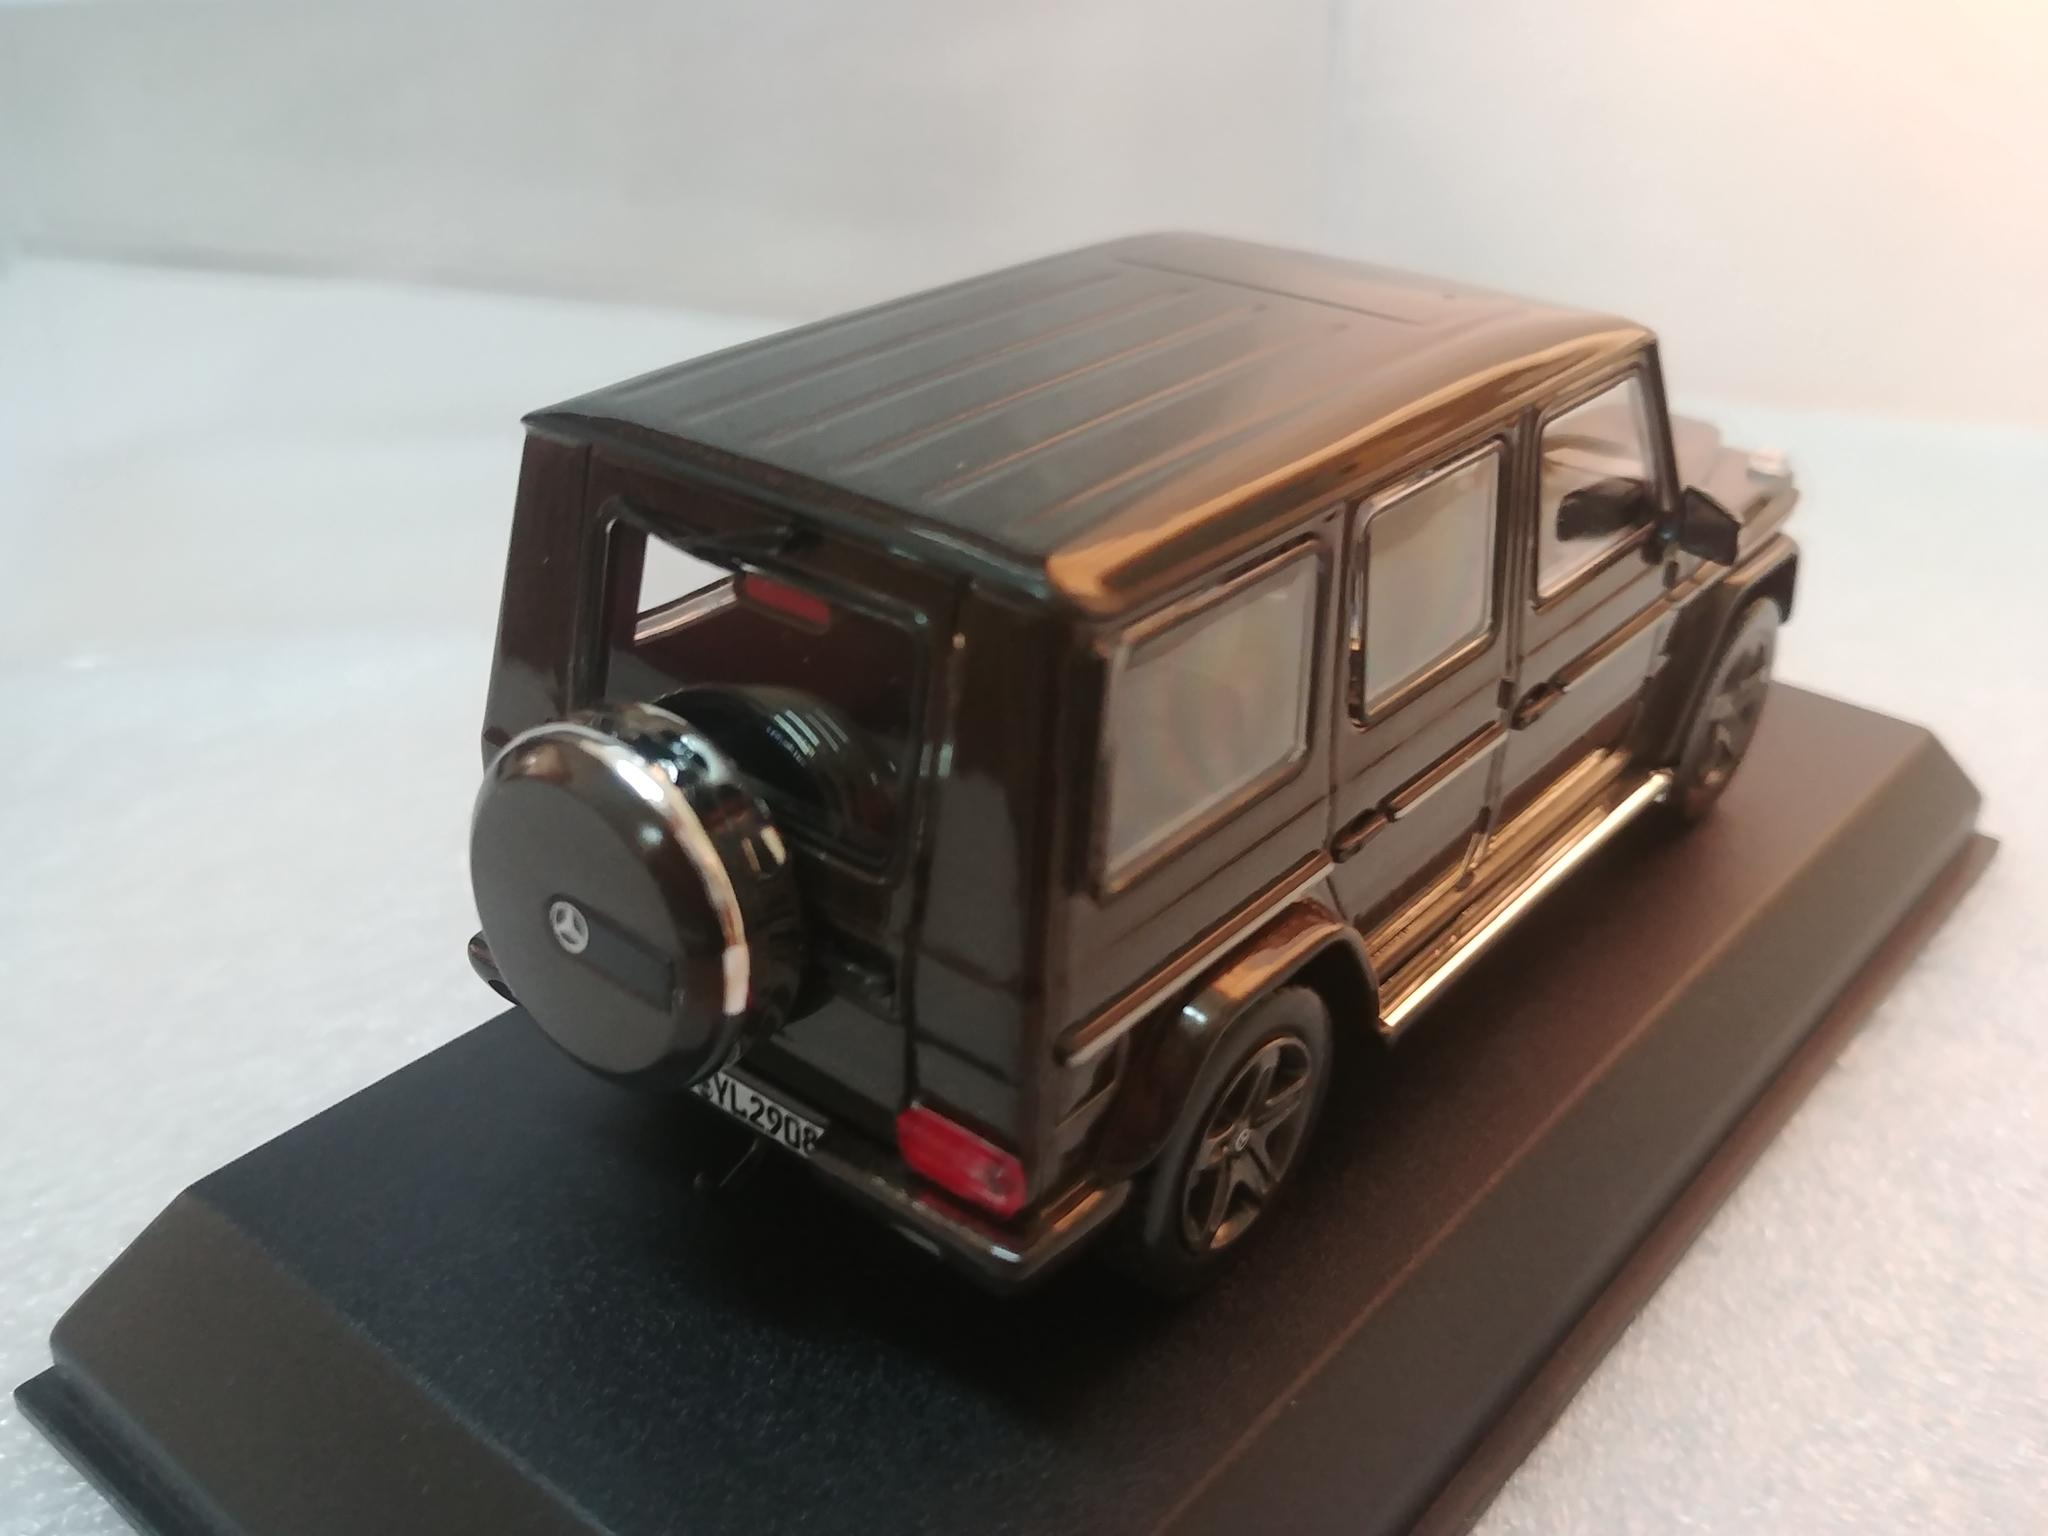 1:43 scale 2 car models